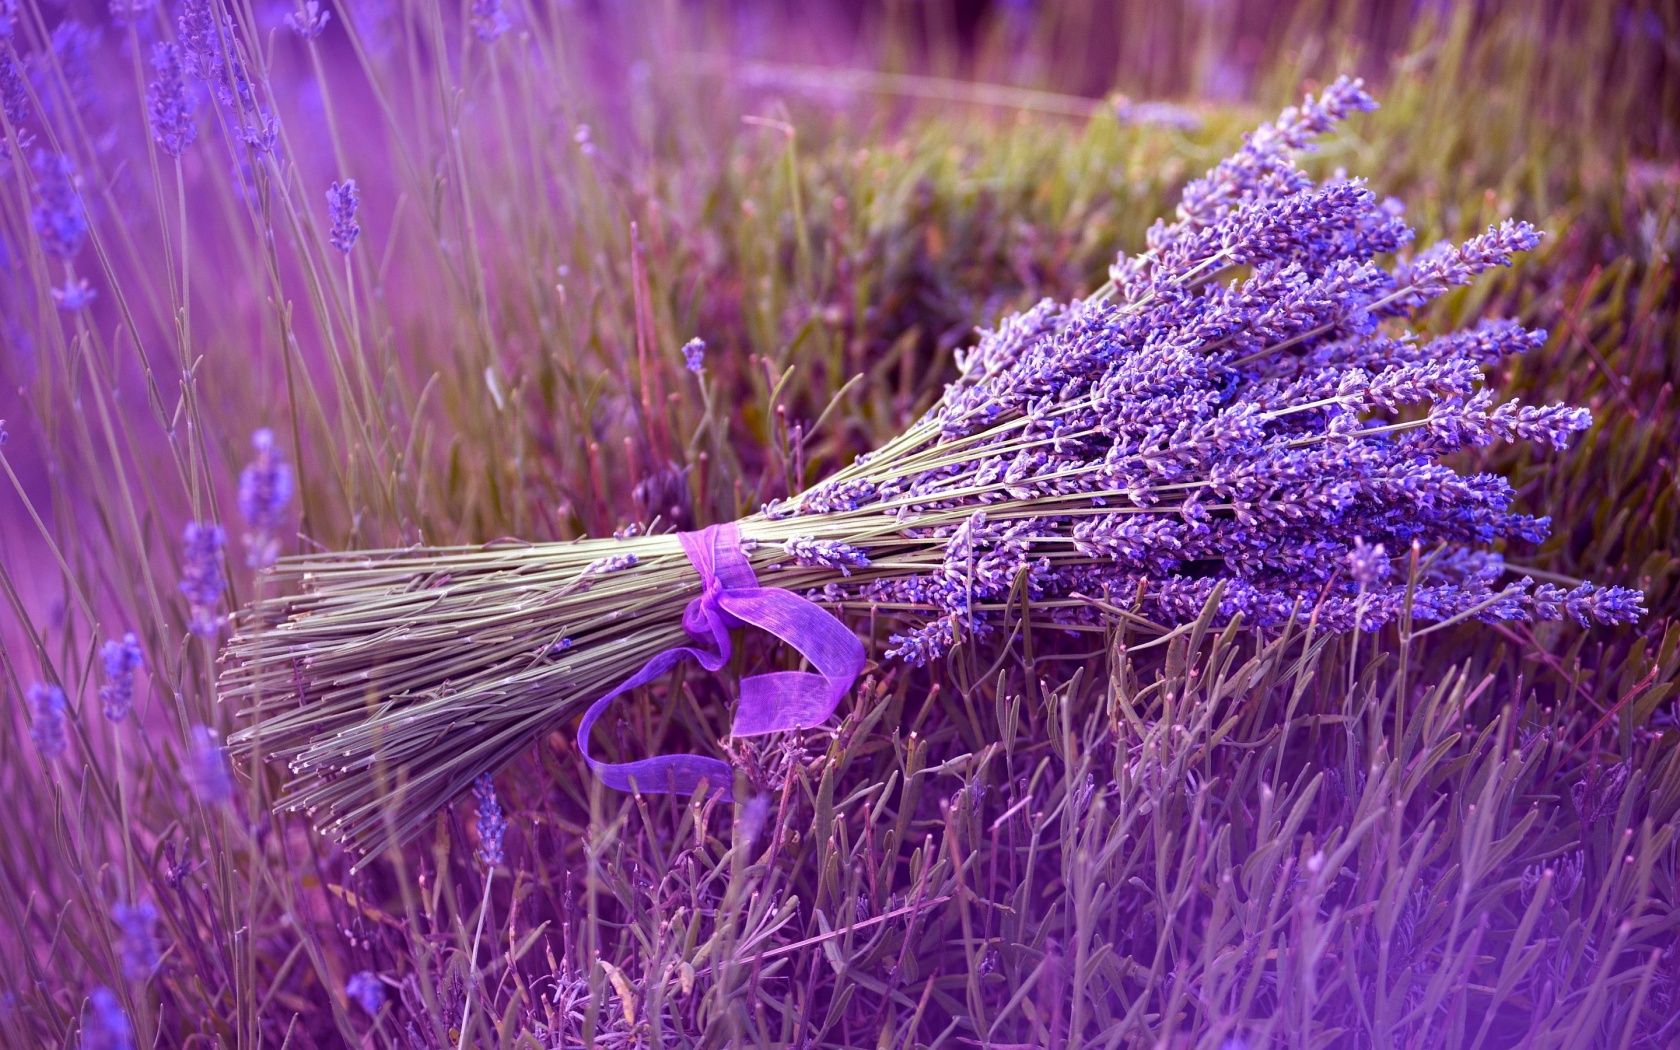 Using dry natural herbs